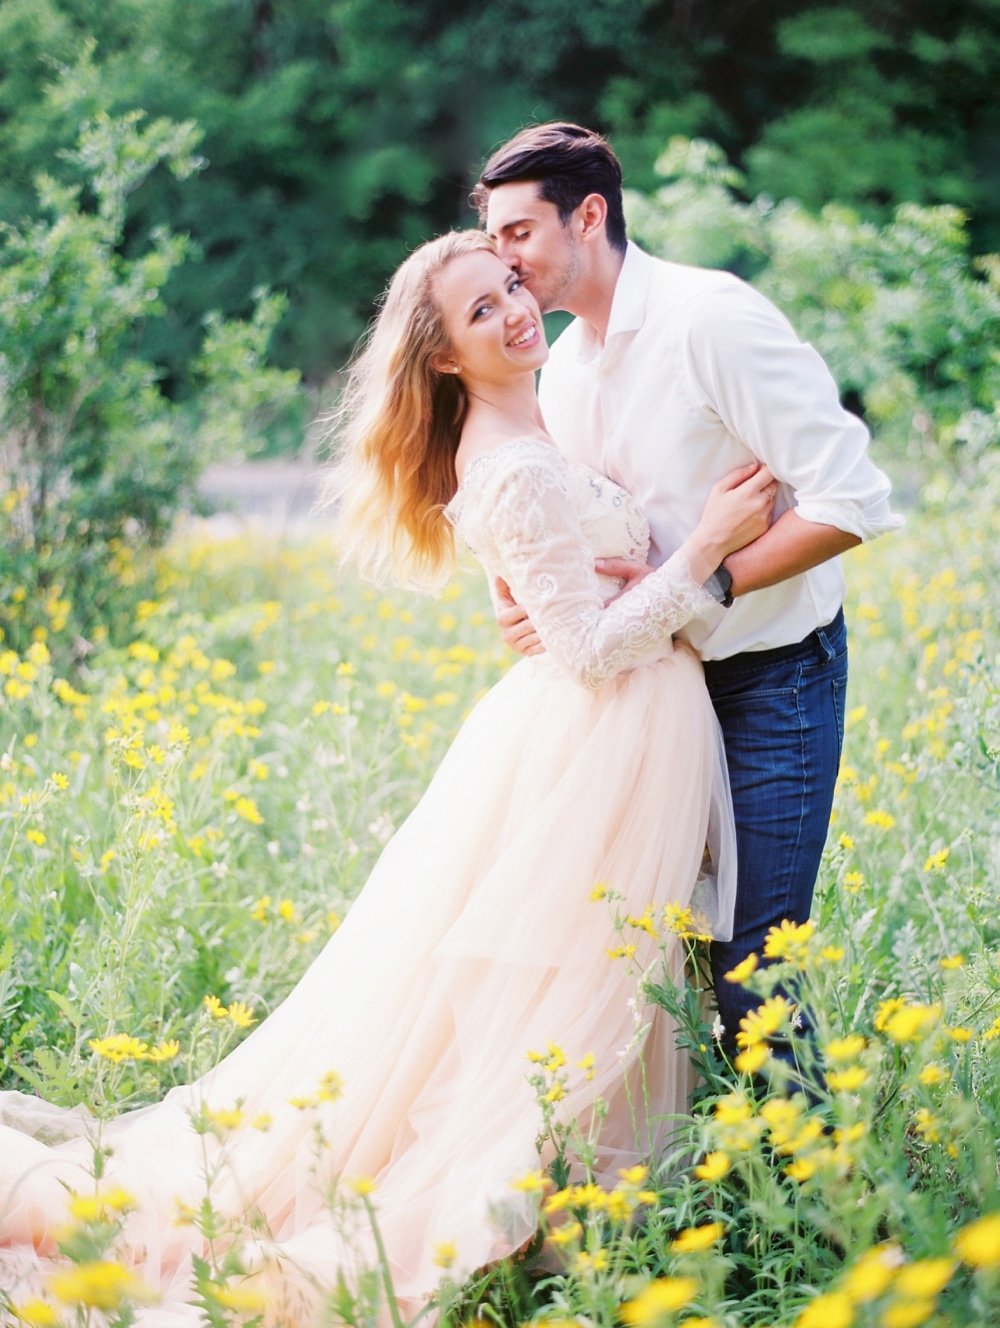 kristin-la-voie-photography-austin-wedding-photographer-69